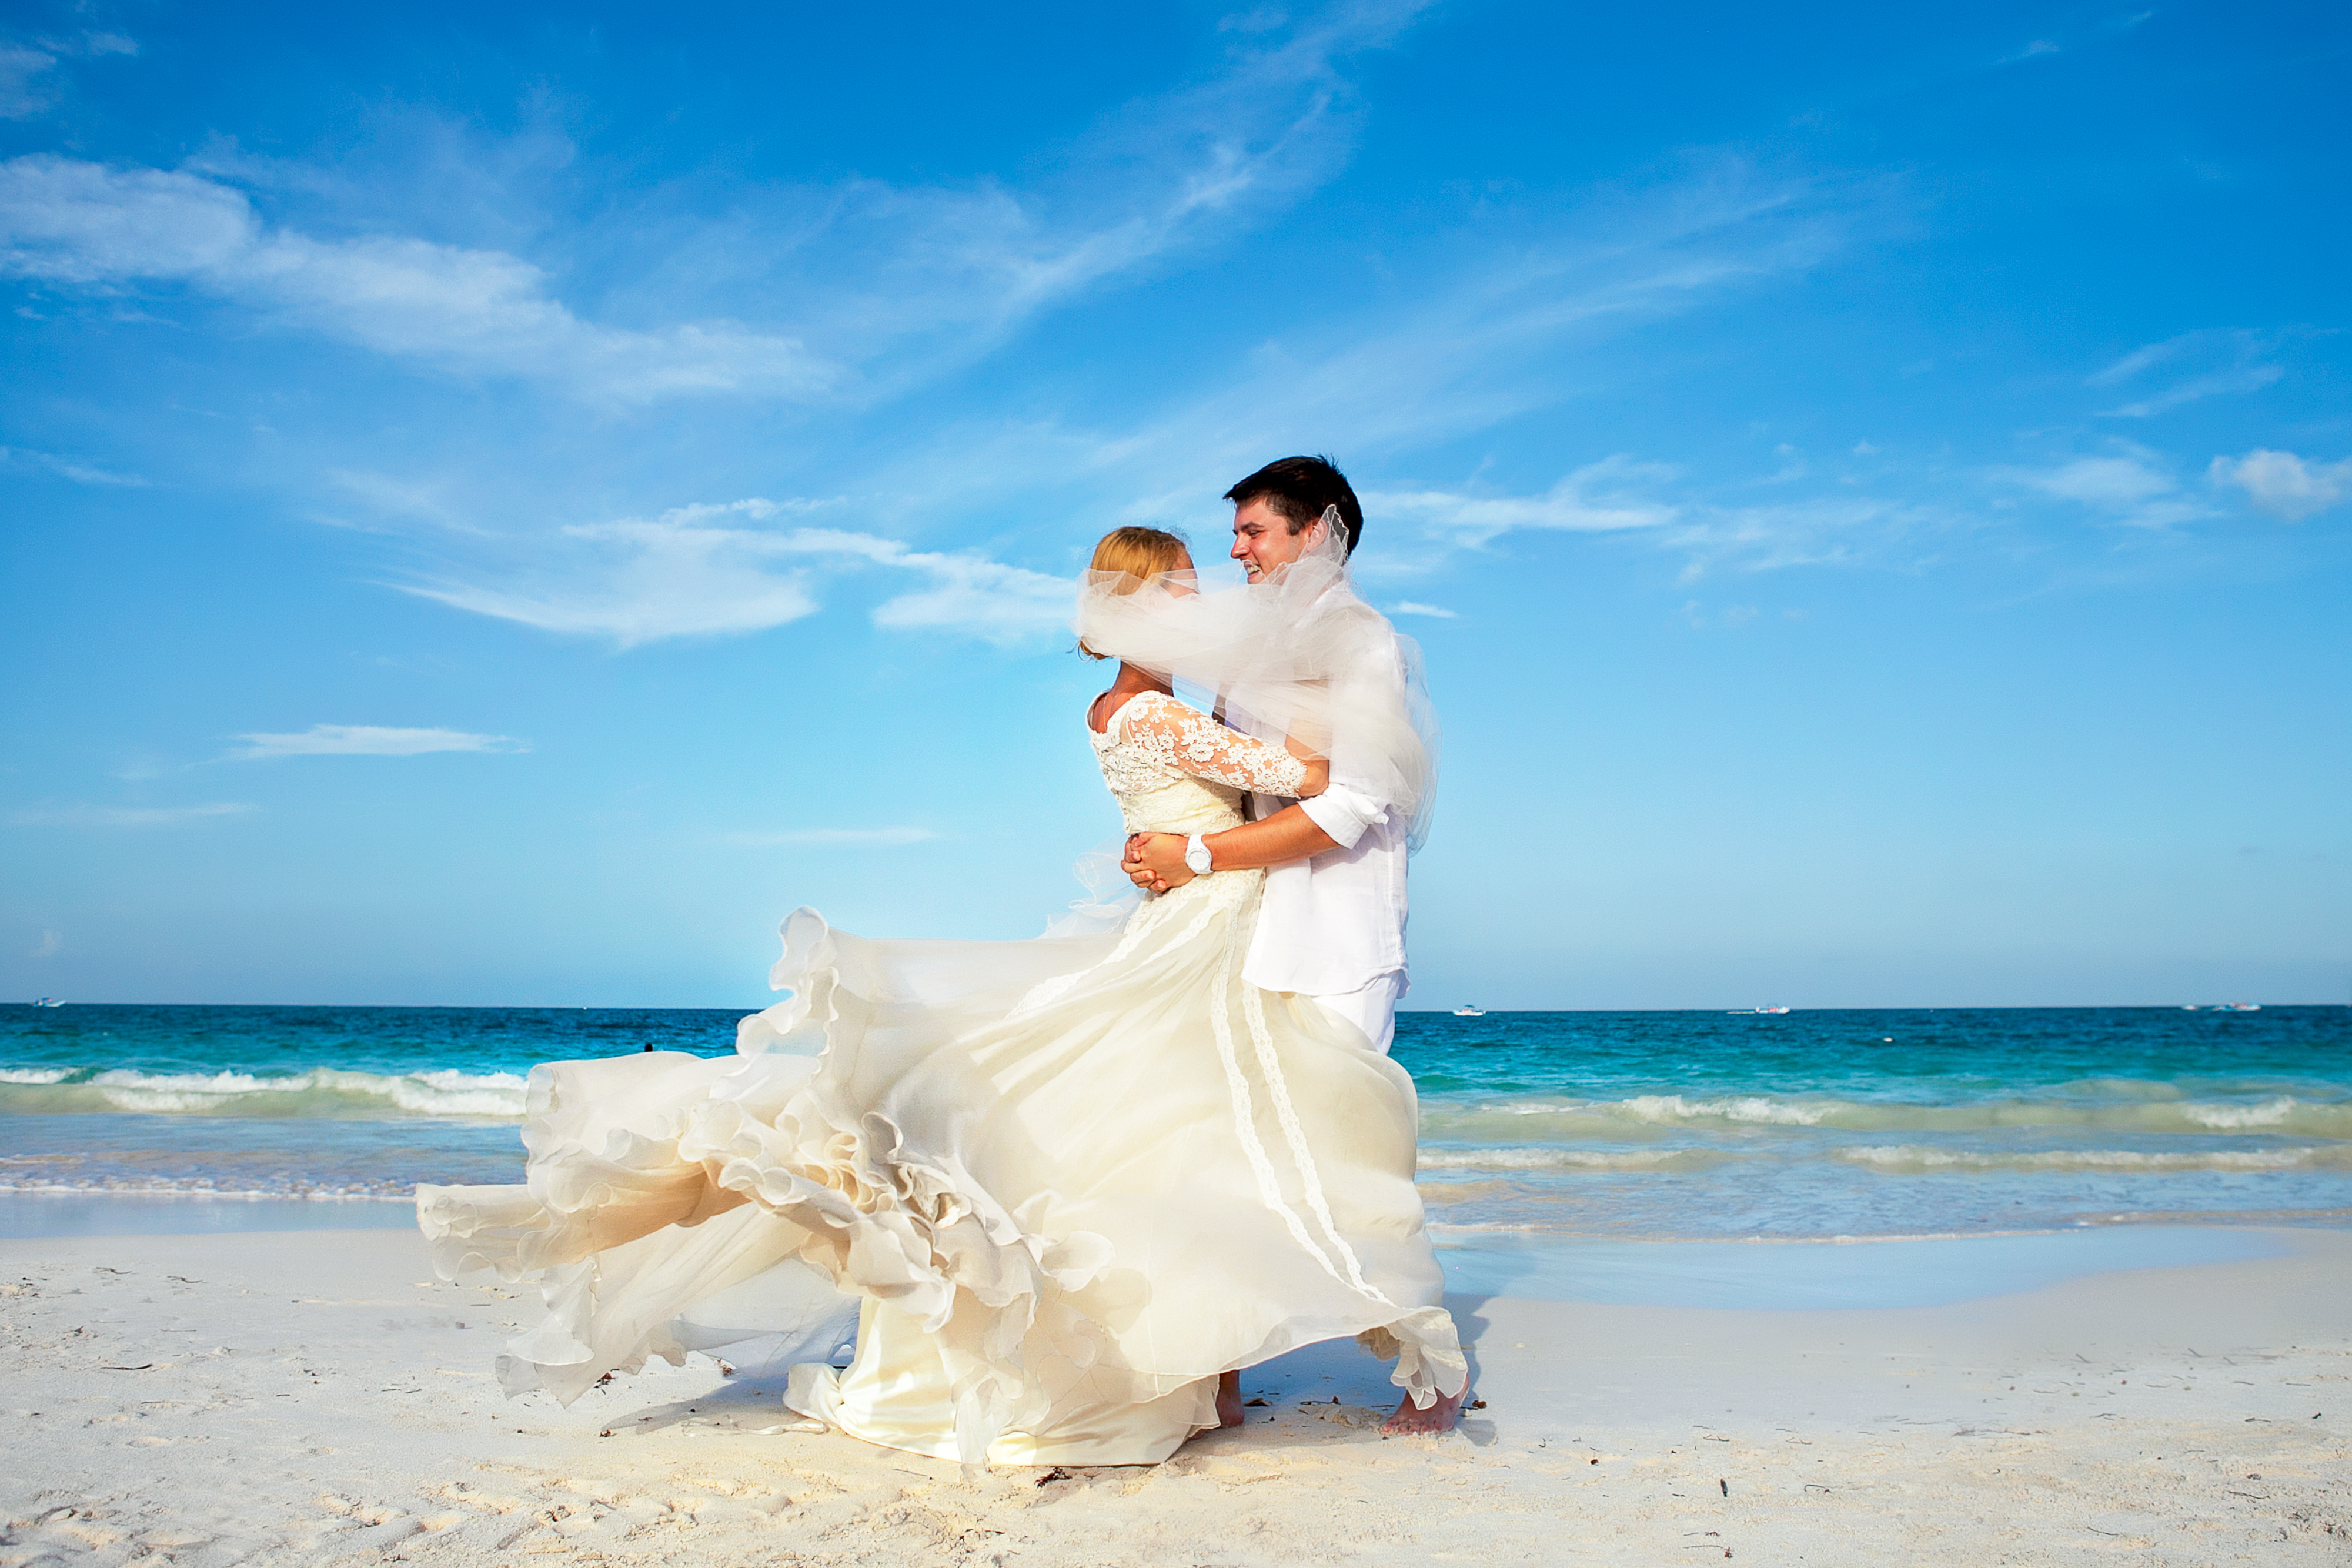 Naal Wedding Photography - Naal Wedding Photography